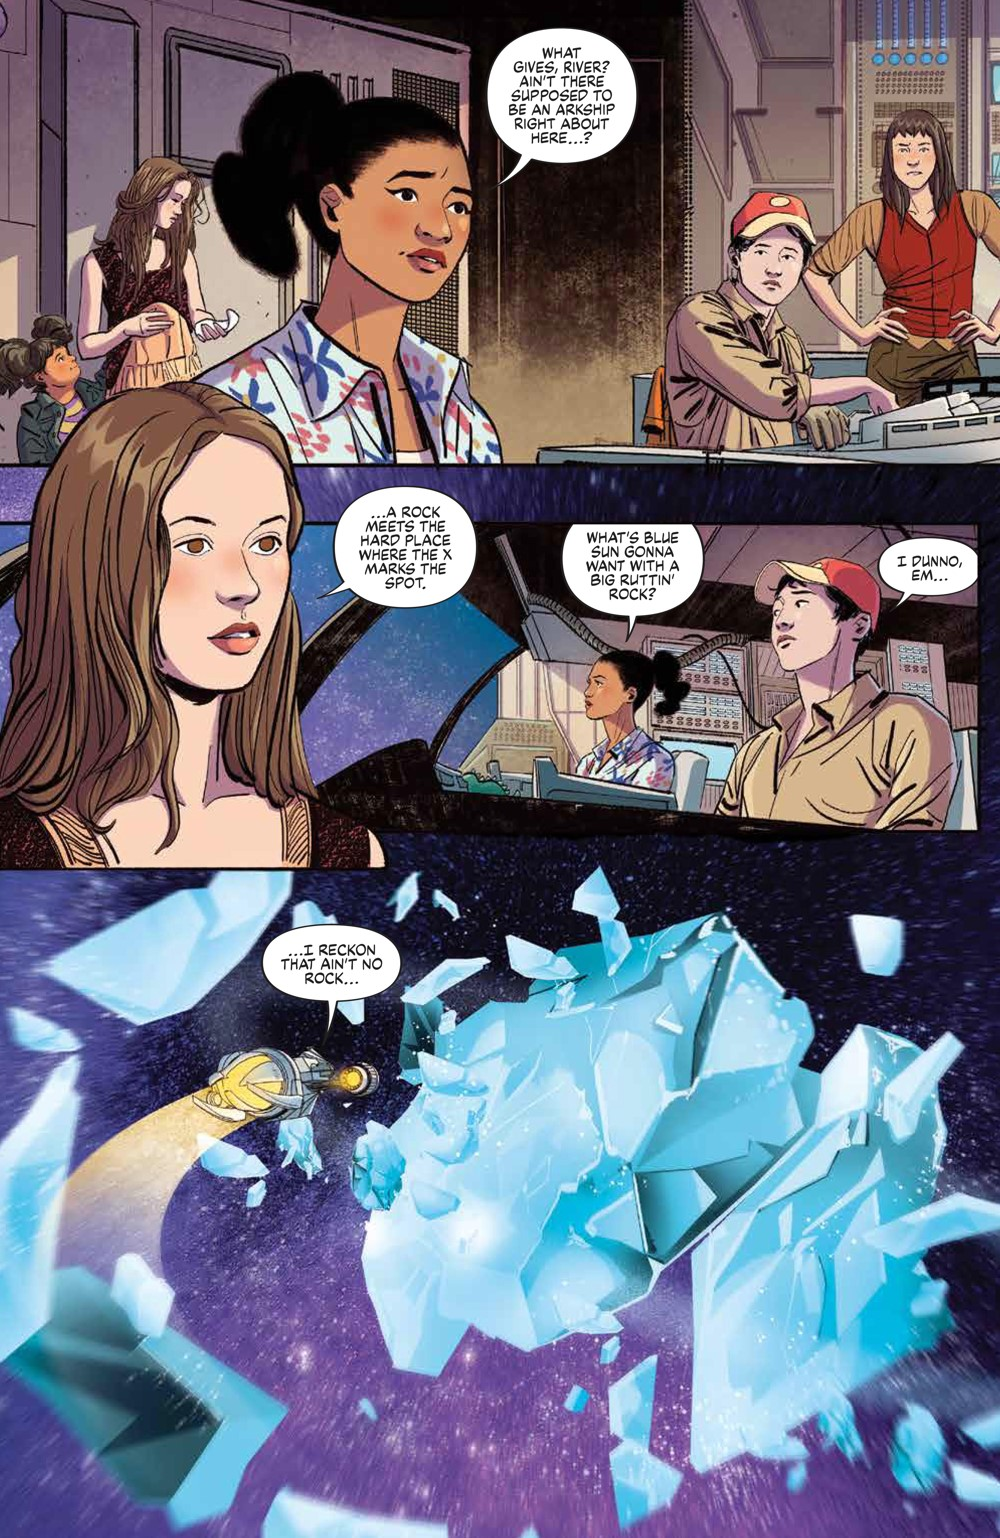 Firefly_BrandNewVerse_006_PRESS_3 ComicList Previews: FIREFLY BRAND NEW 'VERSE #6 (OF 6)